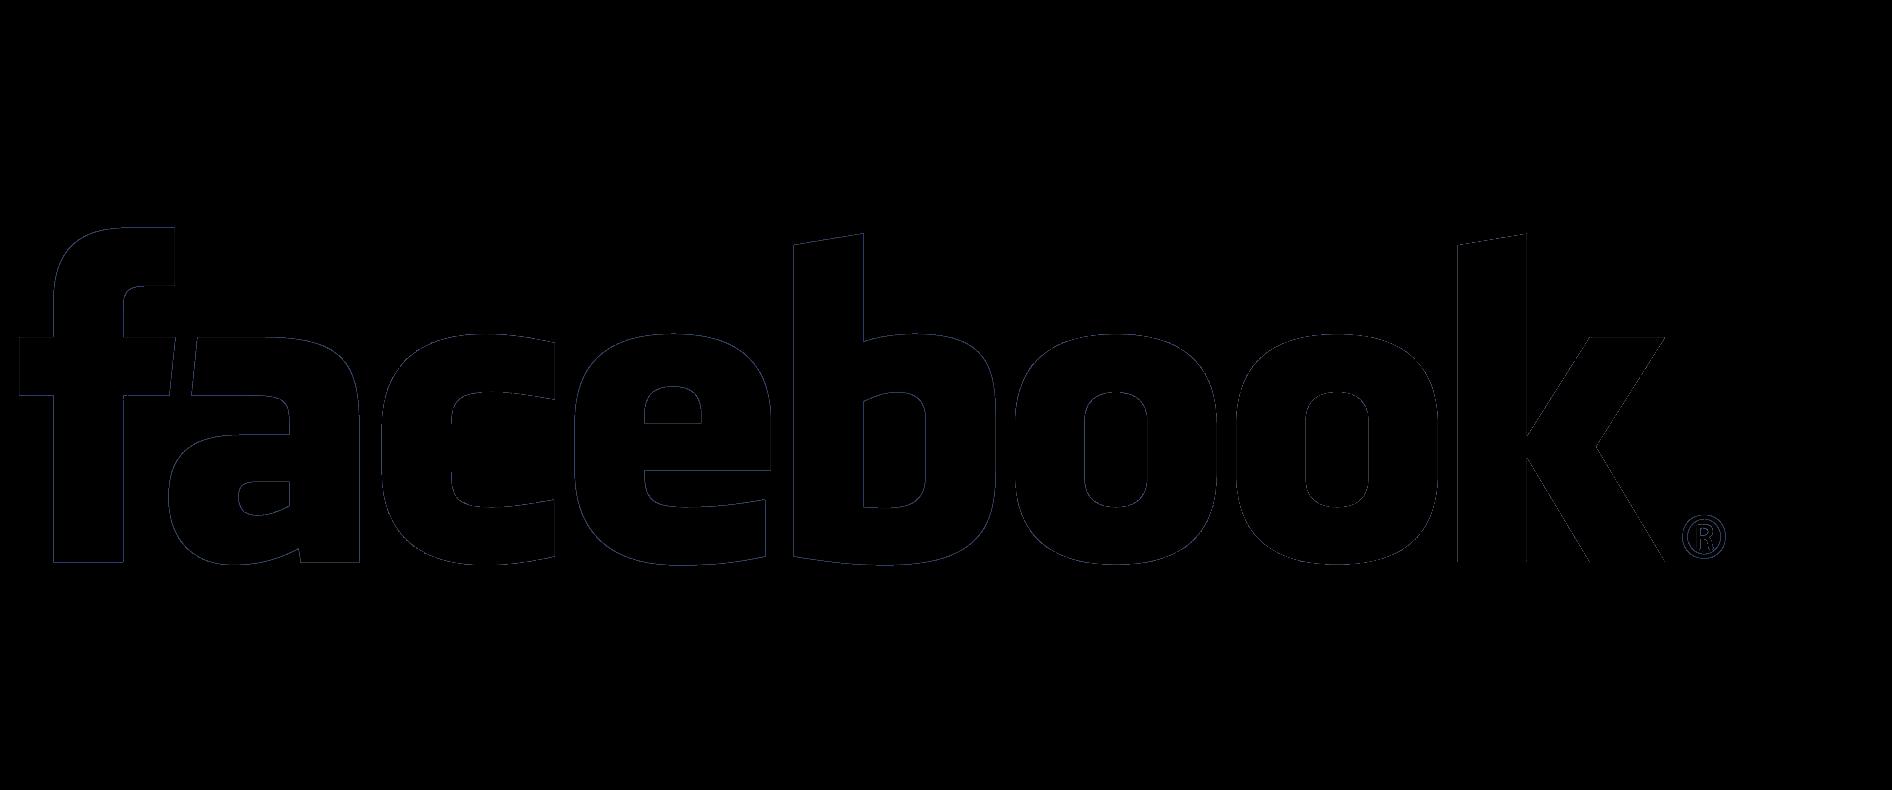 logo_facebook2.png